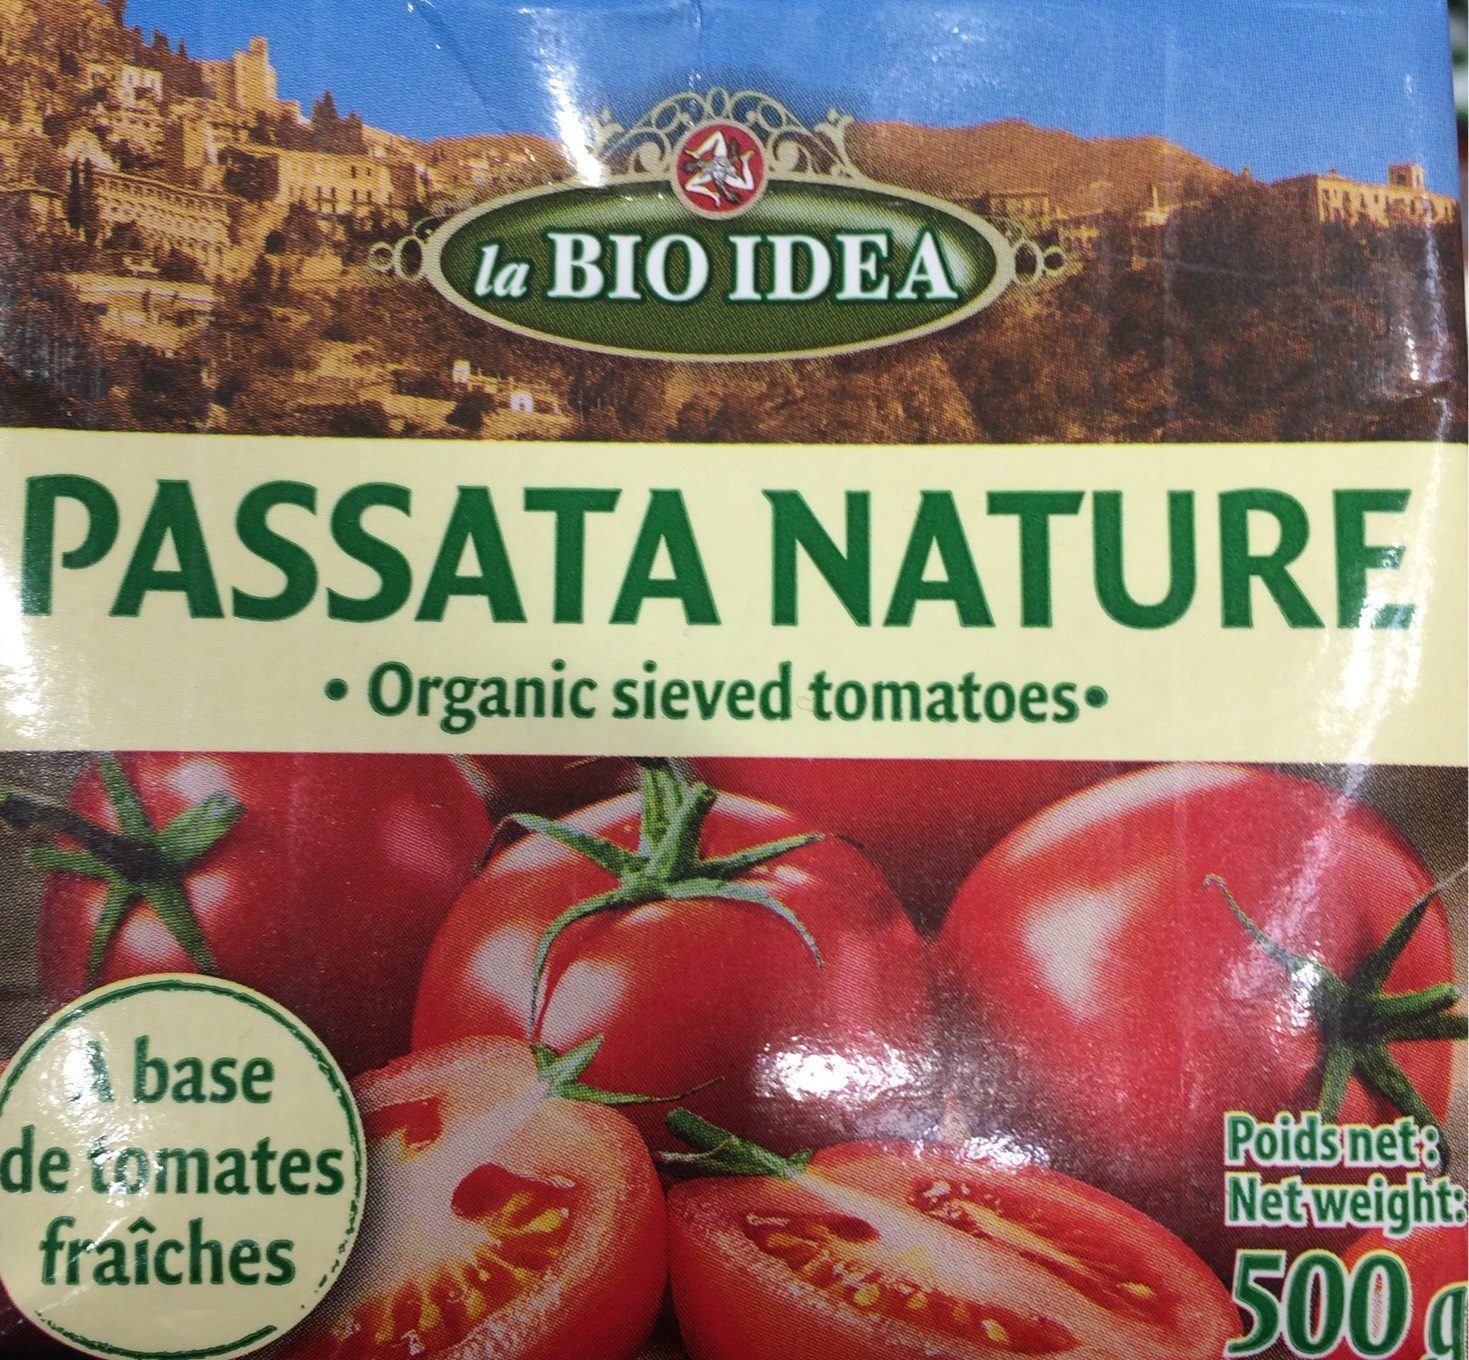 Passata nature - Produit - fr